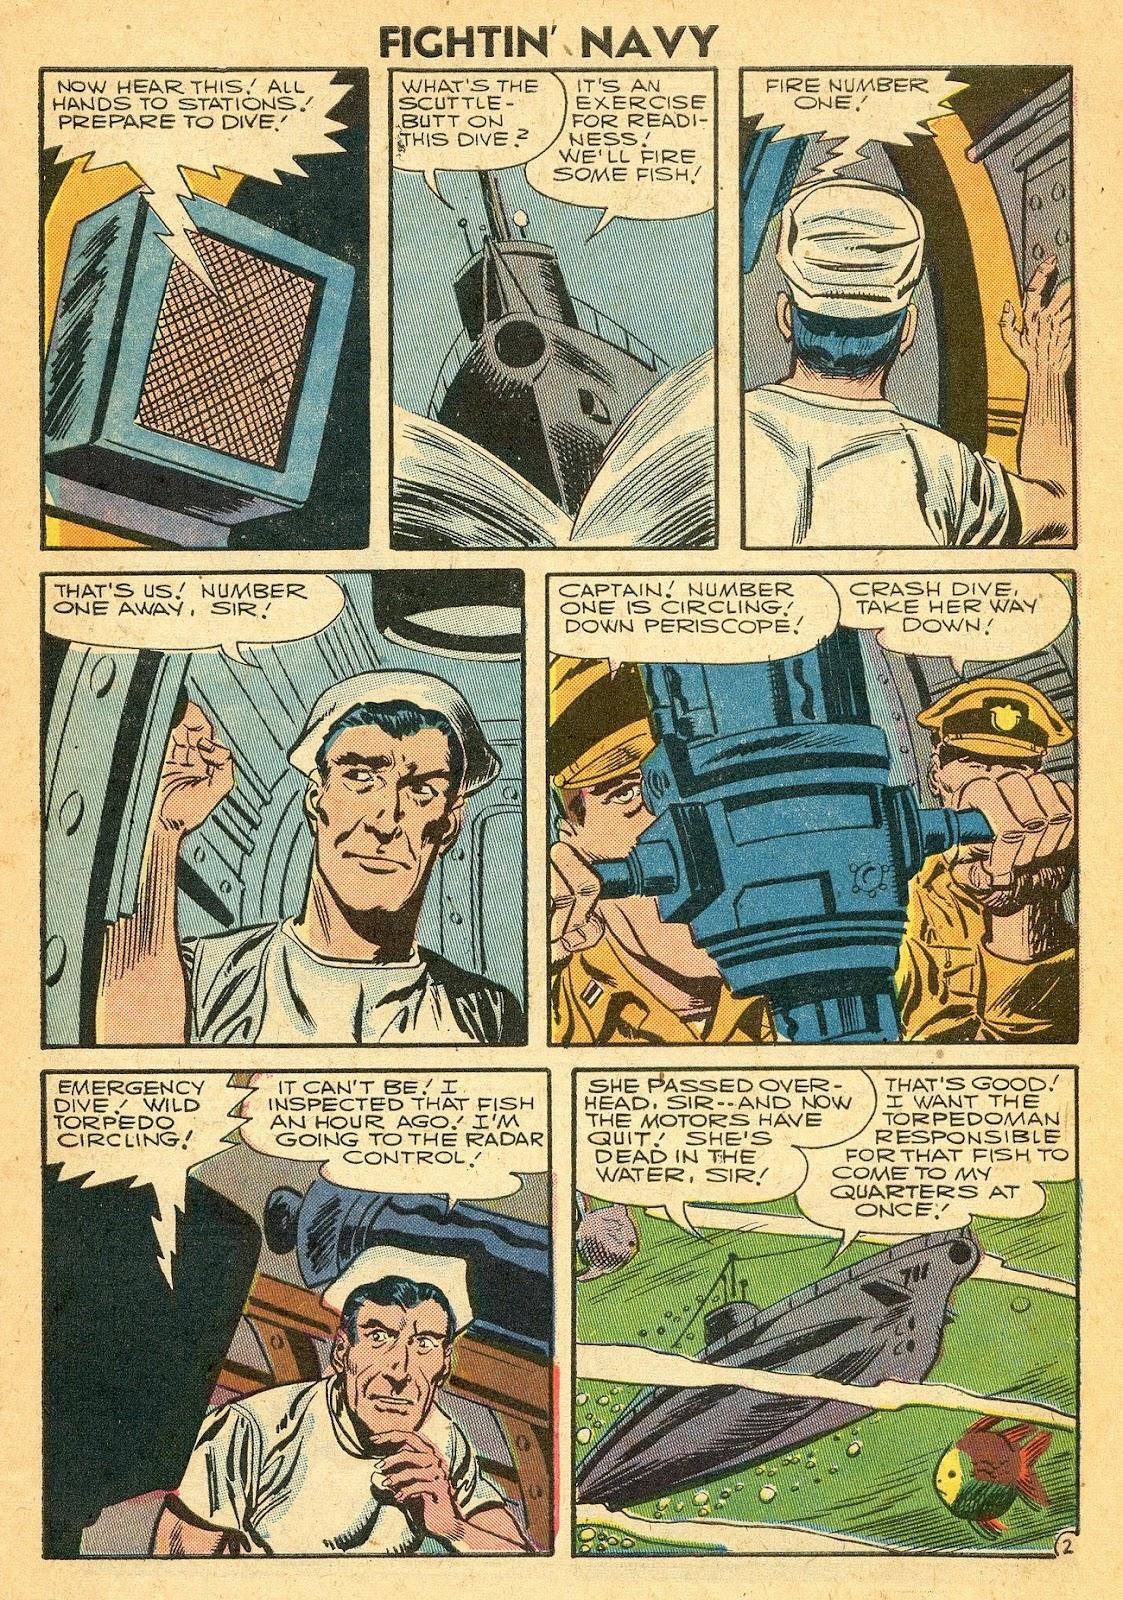 Read online Fightin' Navy comic -  Issue #77 - 27